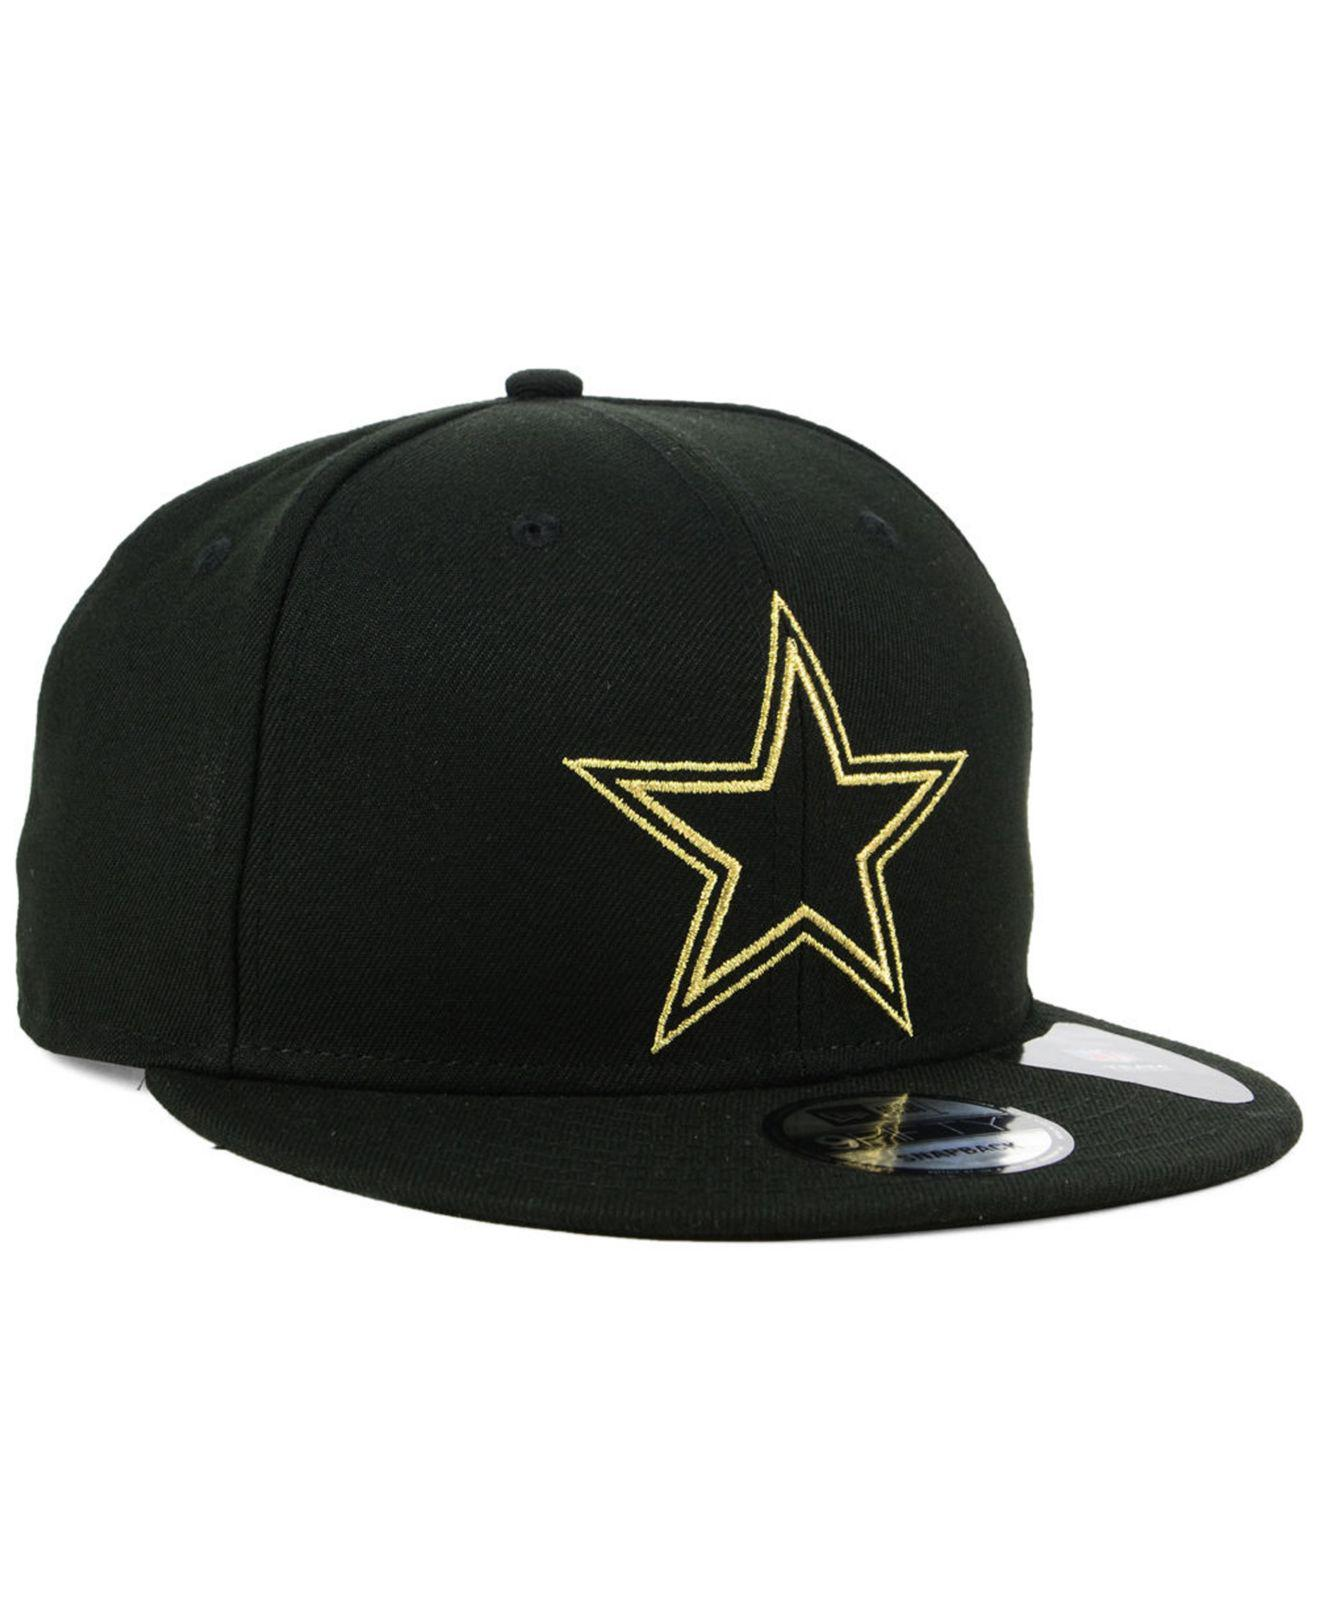 f47e6b5f7 ... denmark release date lyst ktz dallas cowboys tracer 9fifty snapback cap  in black for men 2e832